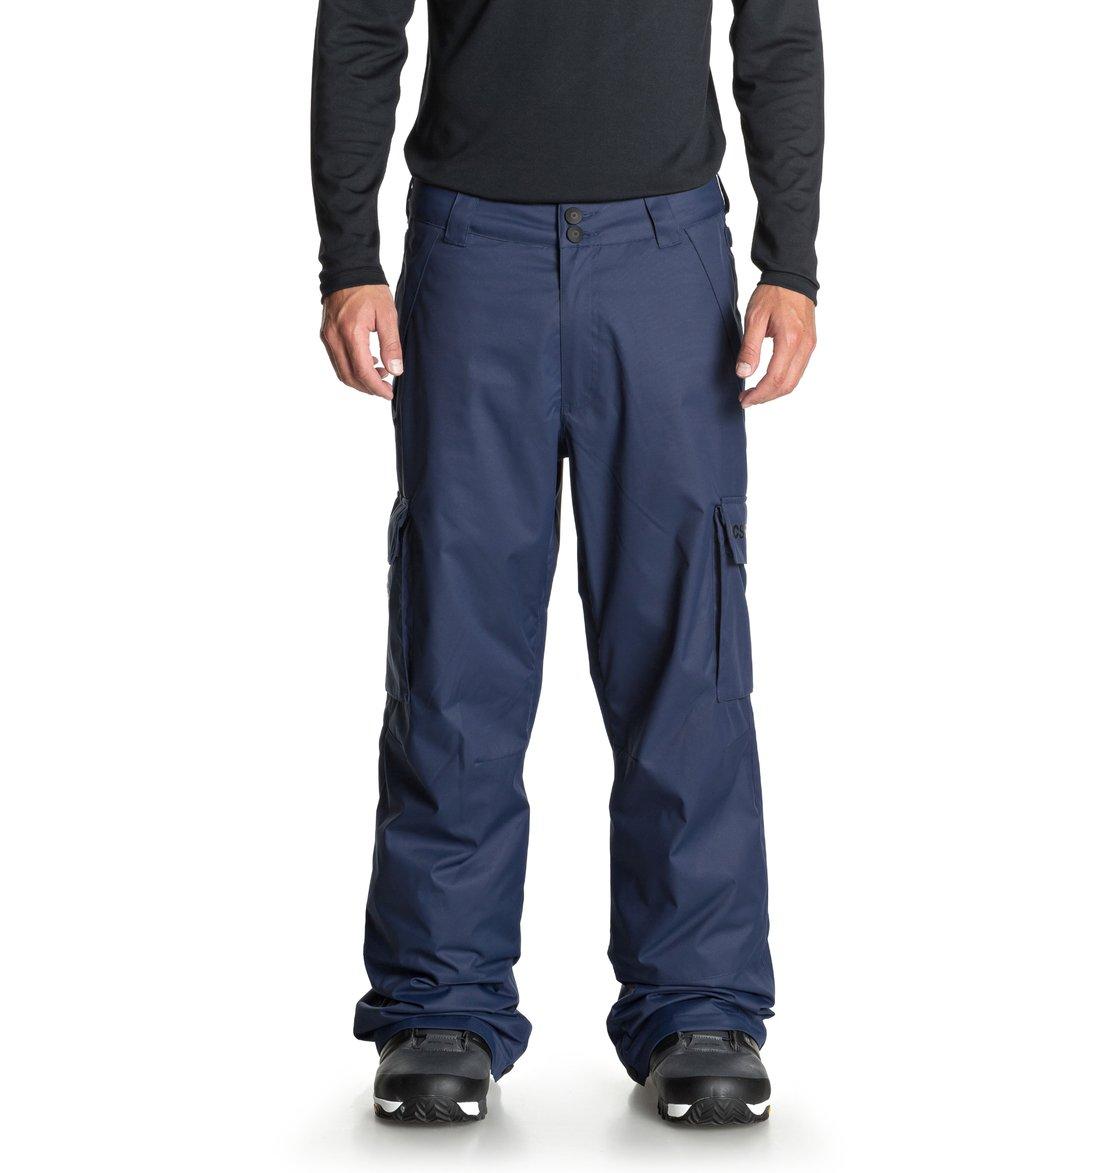 Hombre DC EDYTP03036 Banshee Para Shoes Azul para Pantalones Nieve 0 x0AqwPX88